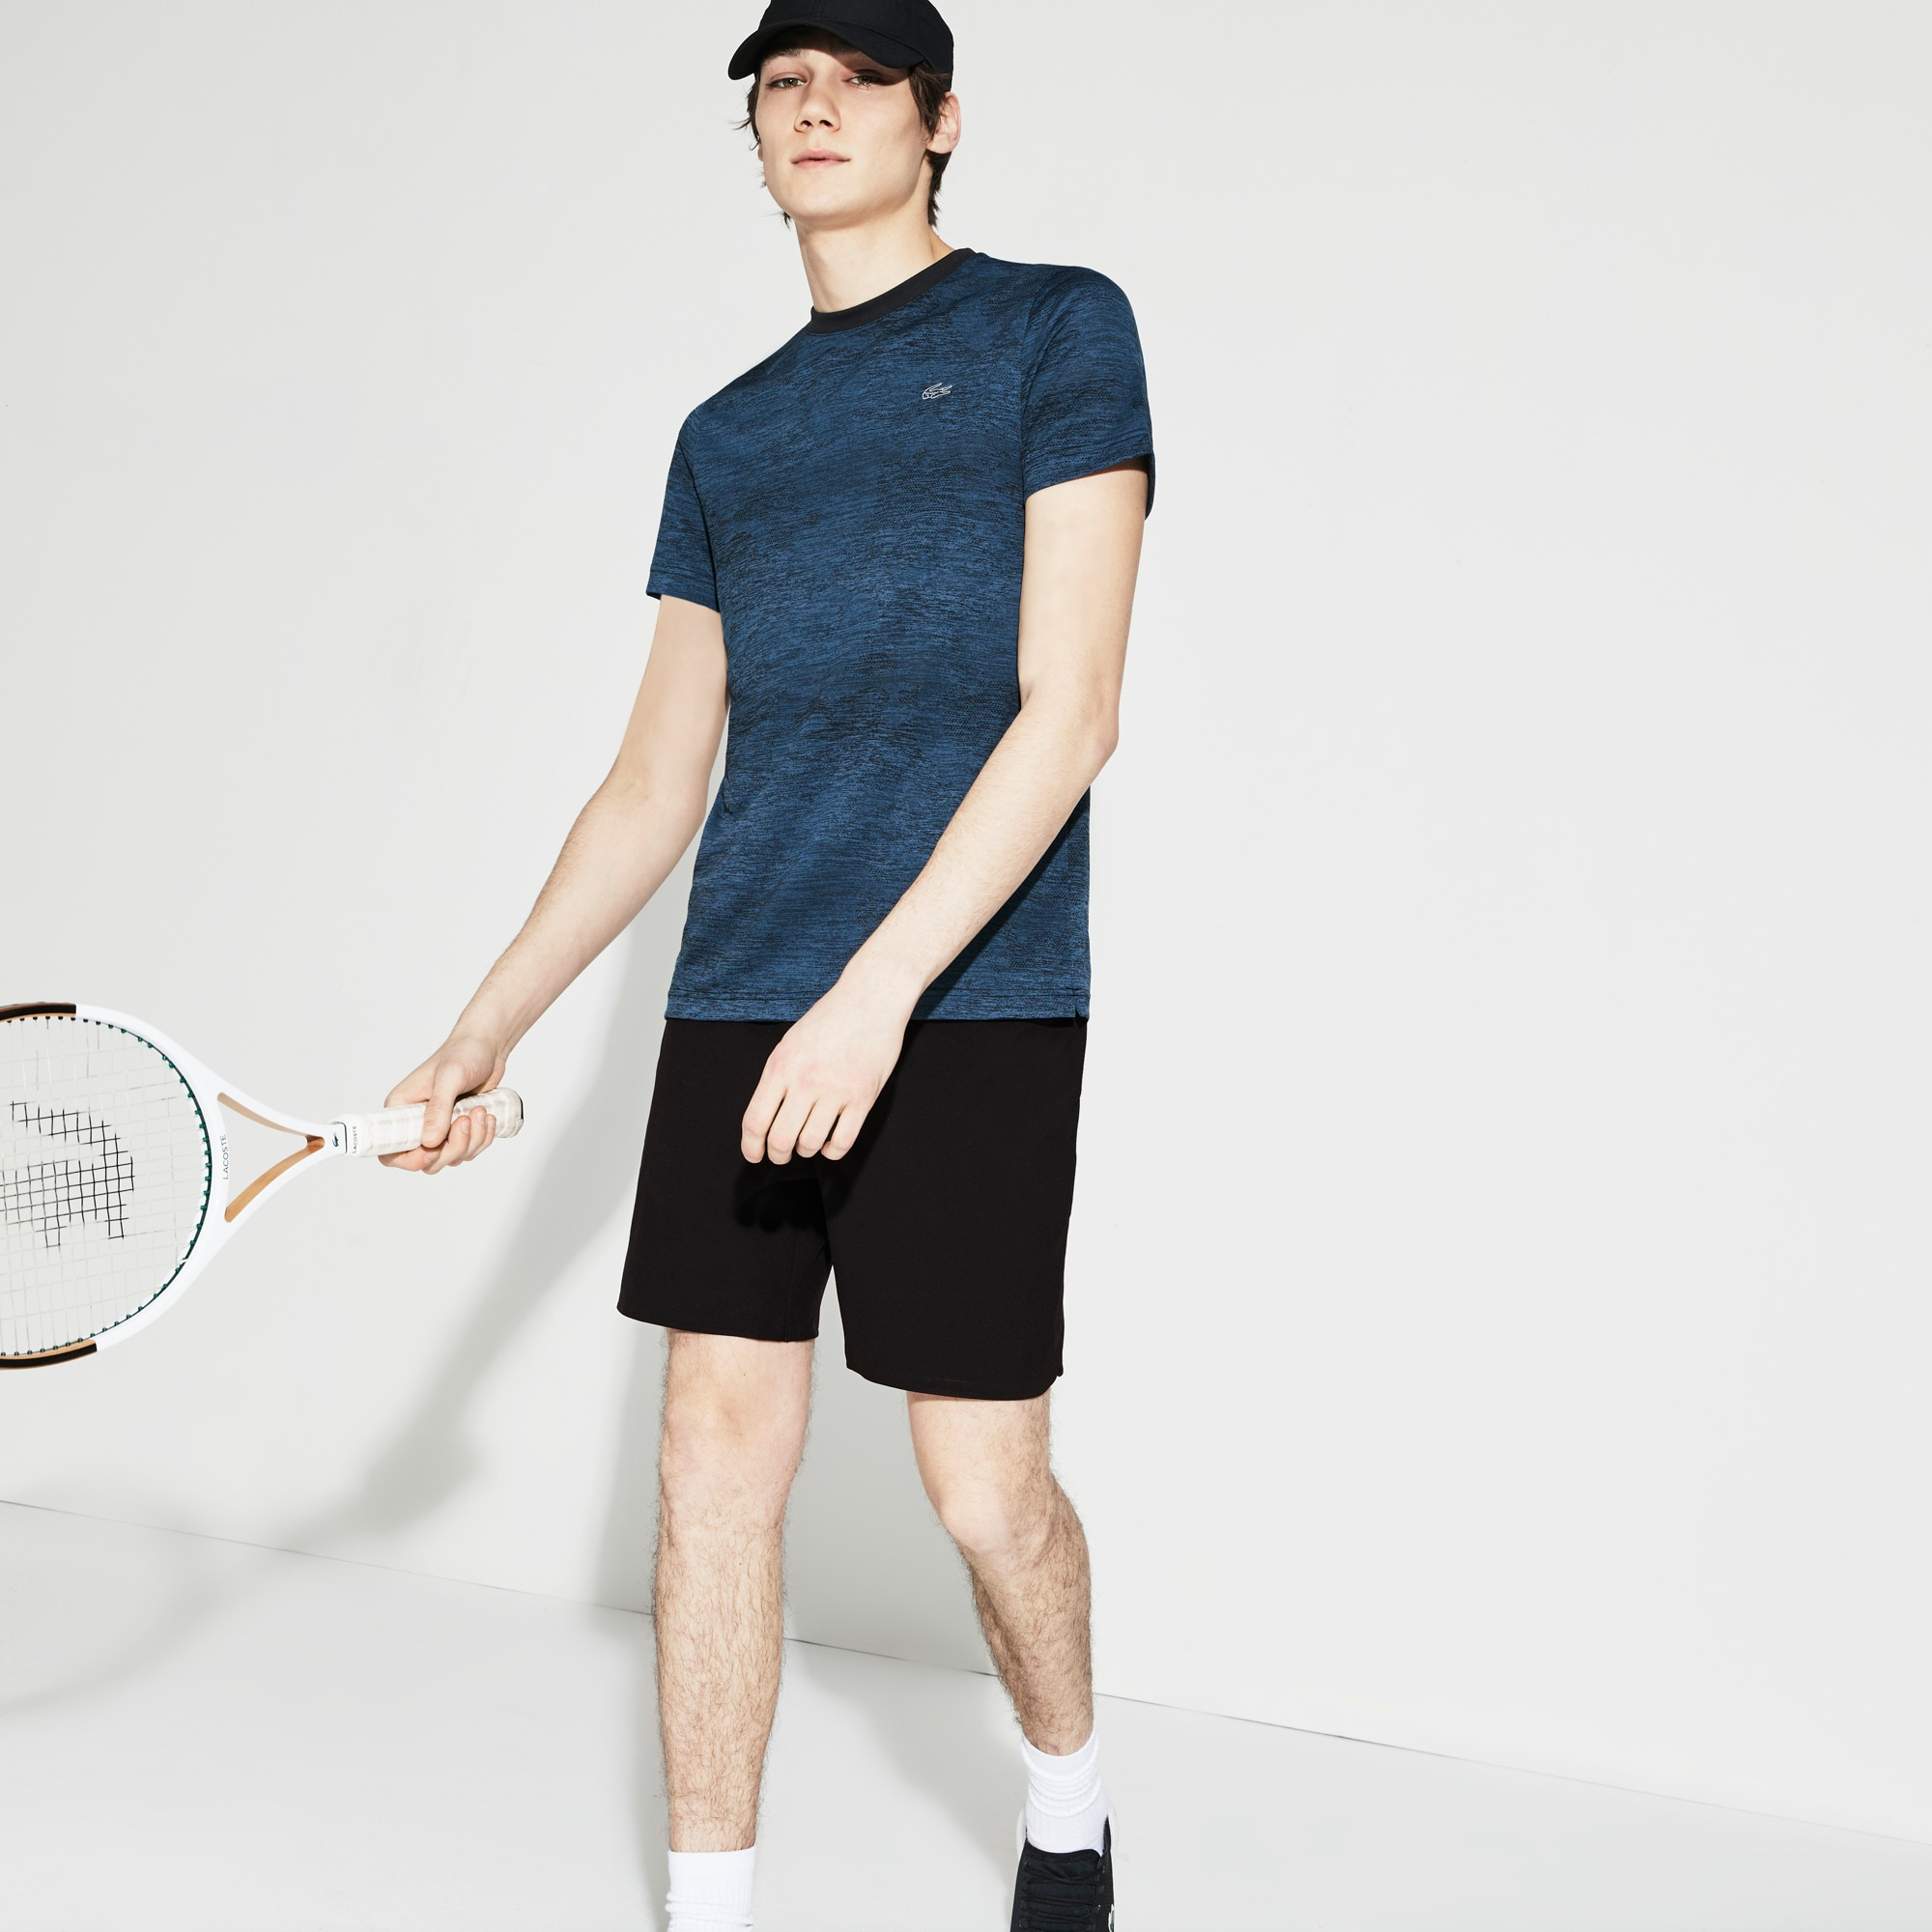 Herren LACOSTE SPORT funktionelle Tennisshorts